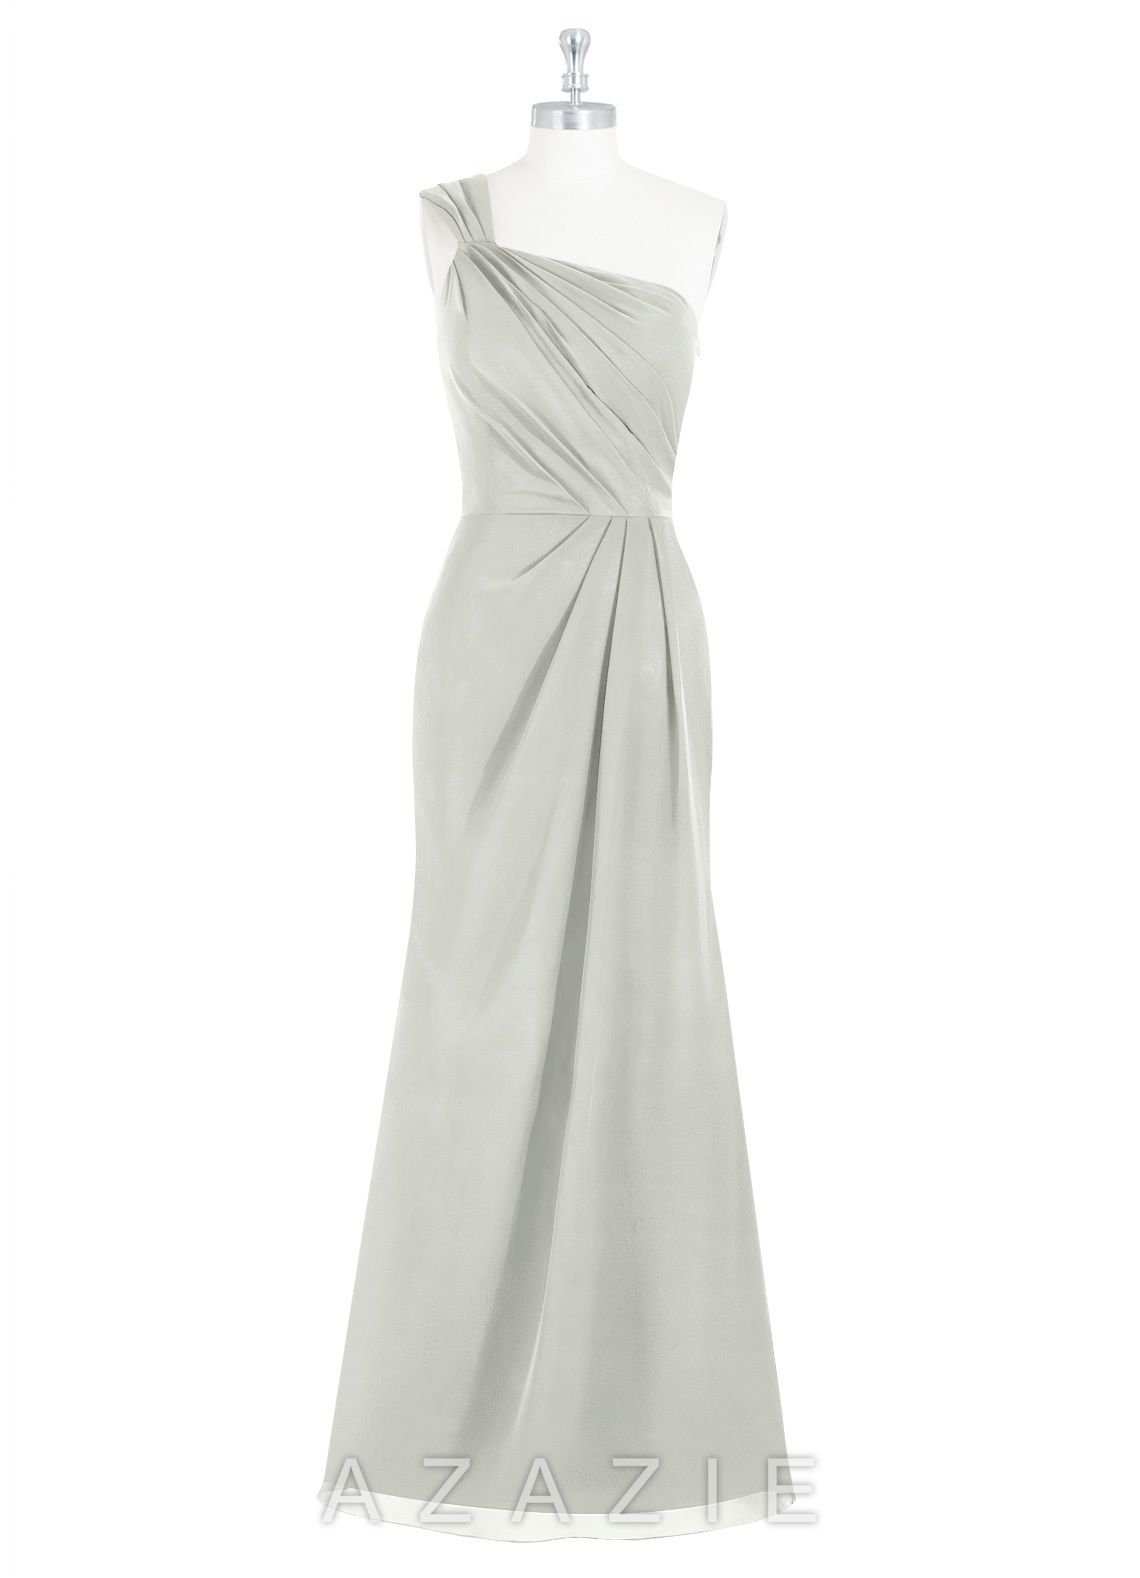 8aad22de15 Azazie Carissa Bridesmaid Dress